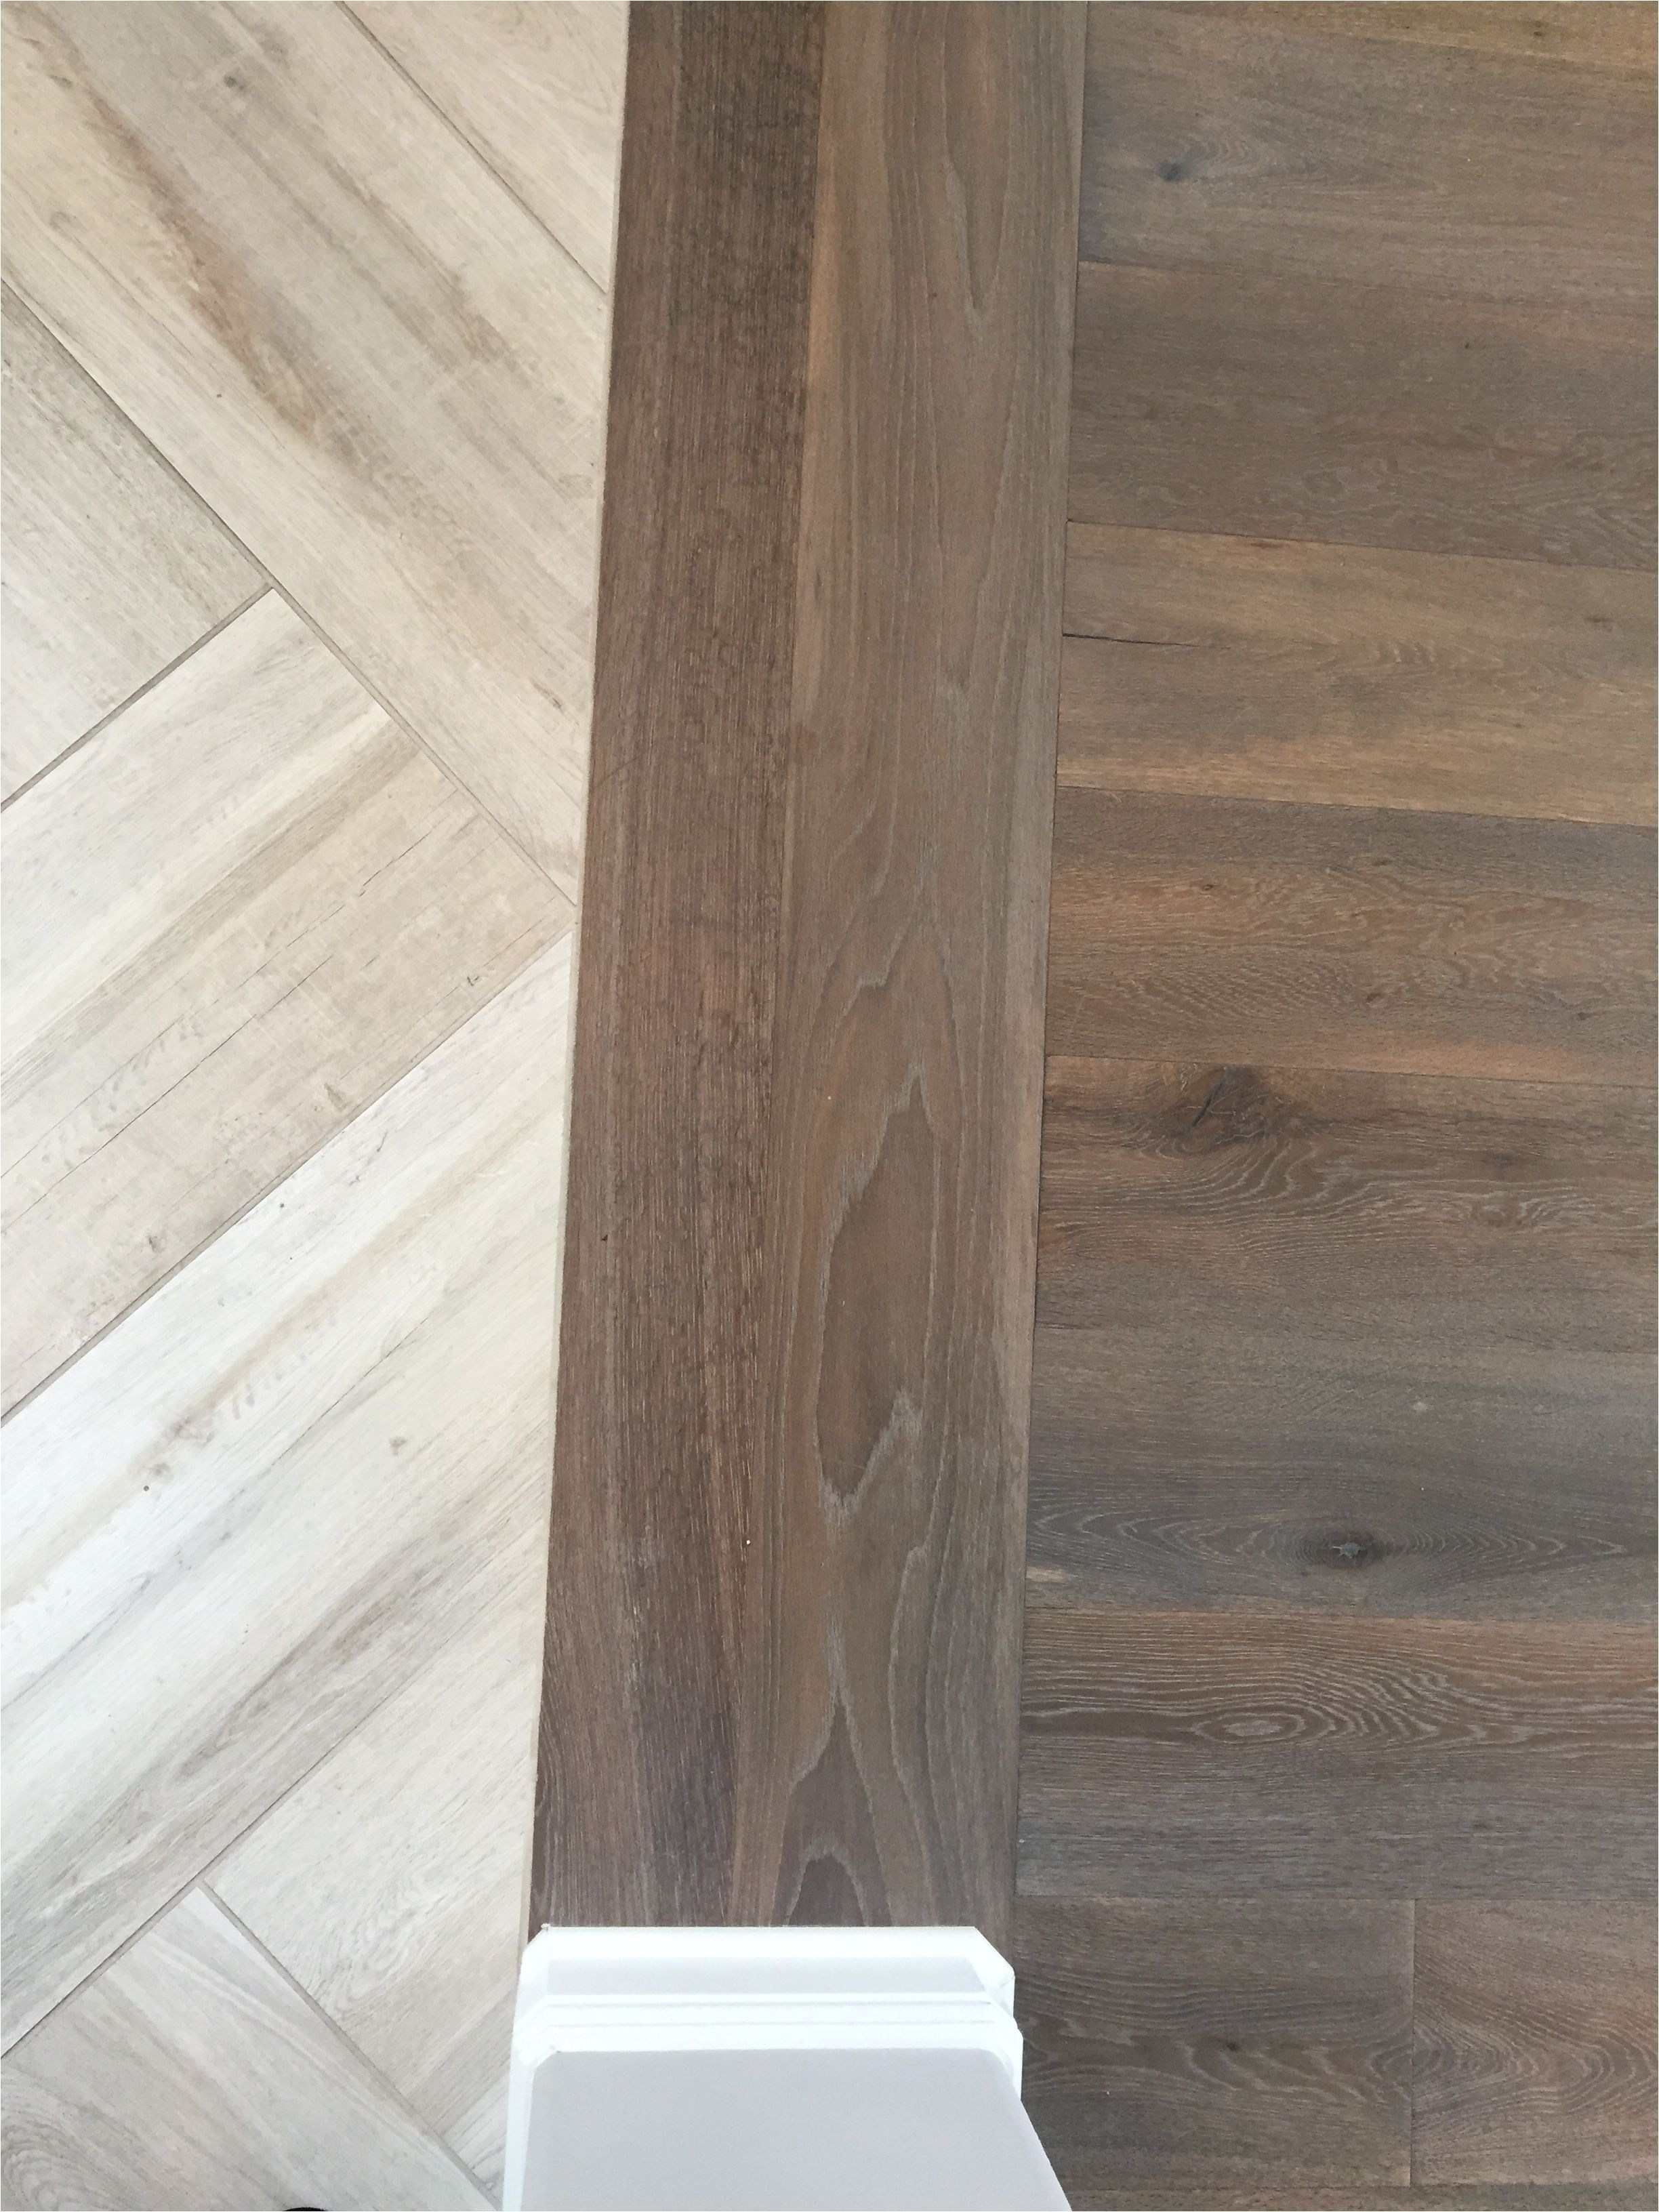 Laminate Wood Flooring Vs Hardwood Cost Of White Washed Engineered Wood Flooring Floor Transition Laminate to Inside White Washed Engineered Wood Flooring Floor Transition Laminate to Herringbone Tile Pattern Model